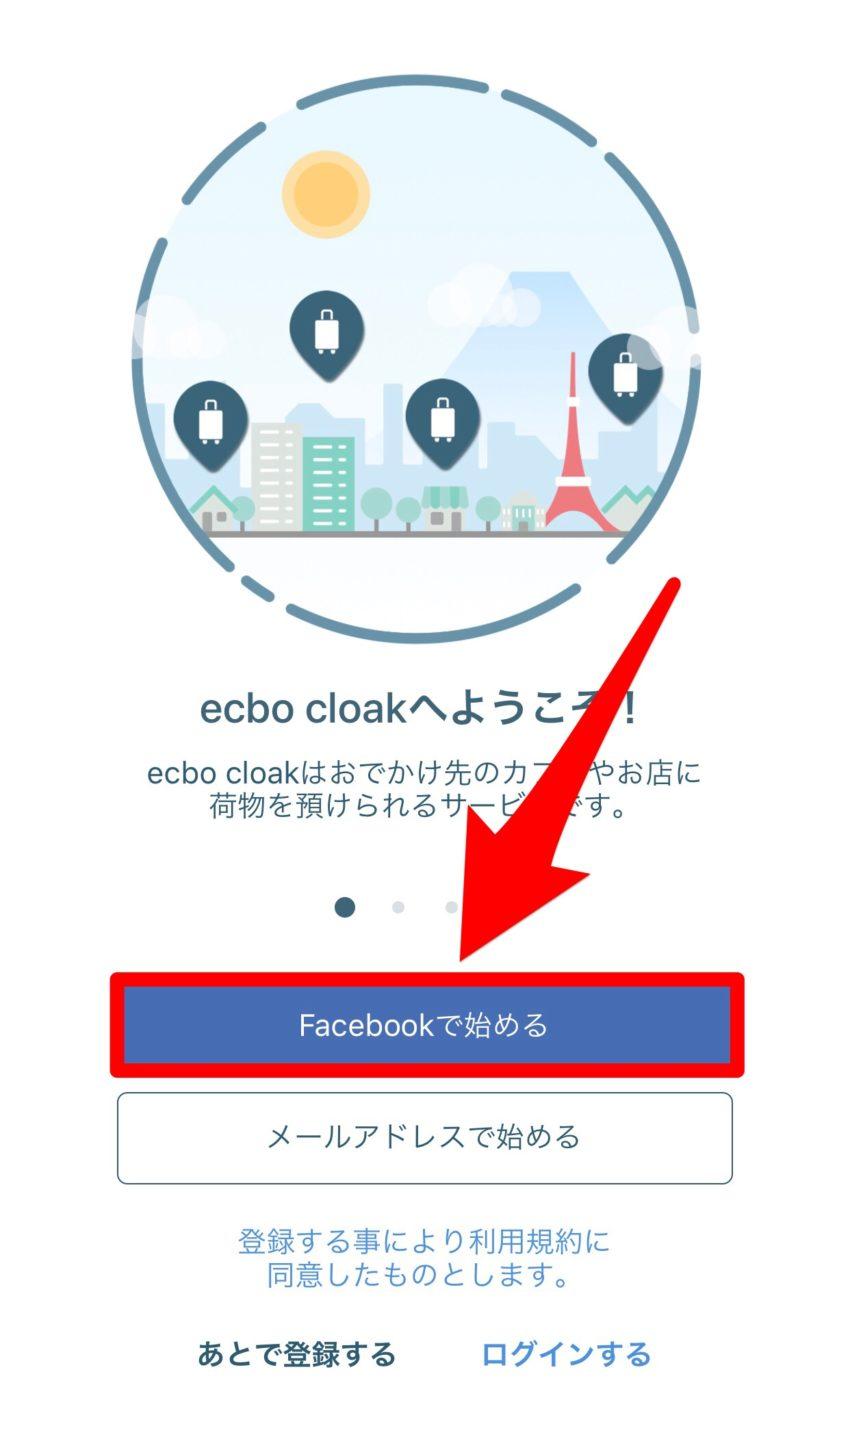 ecbo stoakへの登録